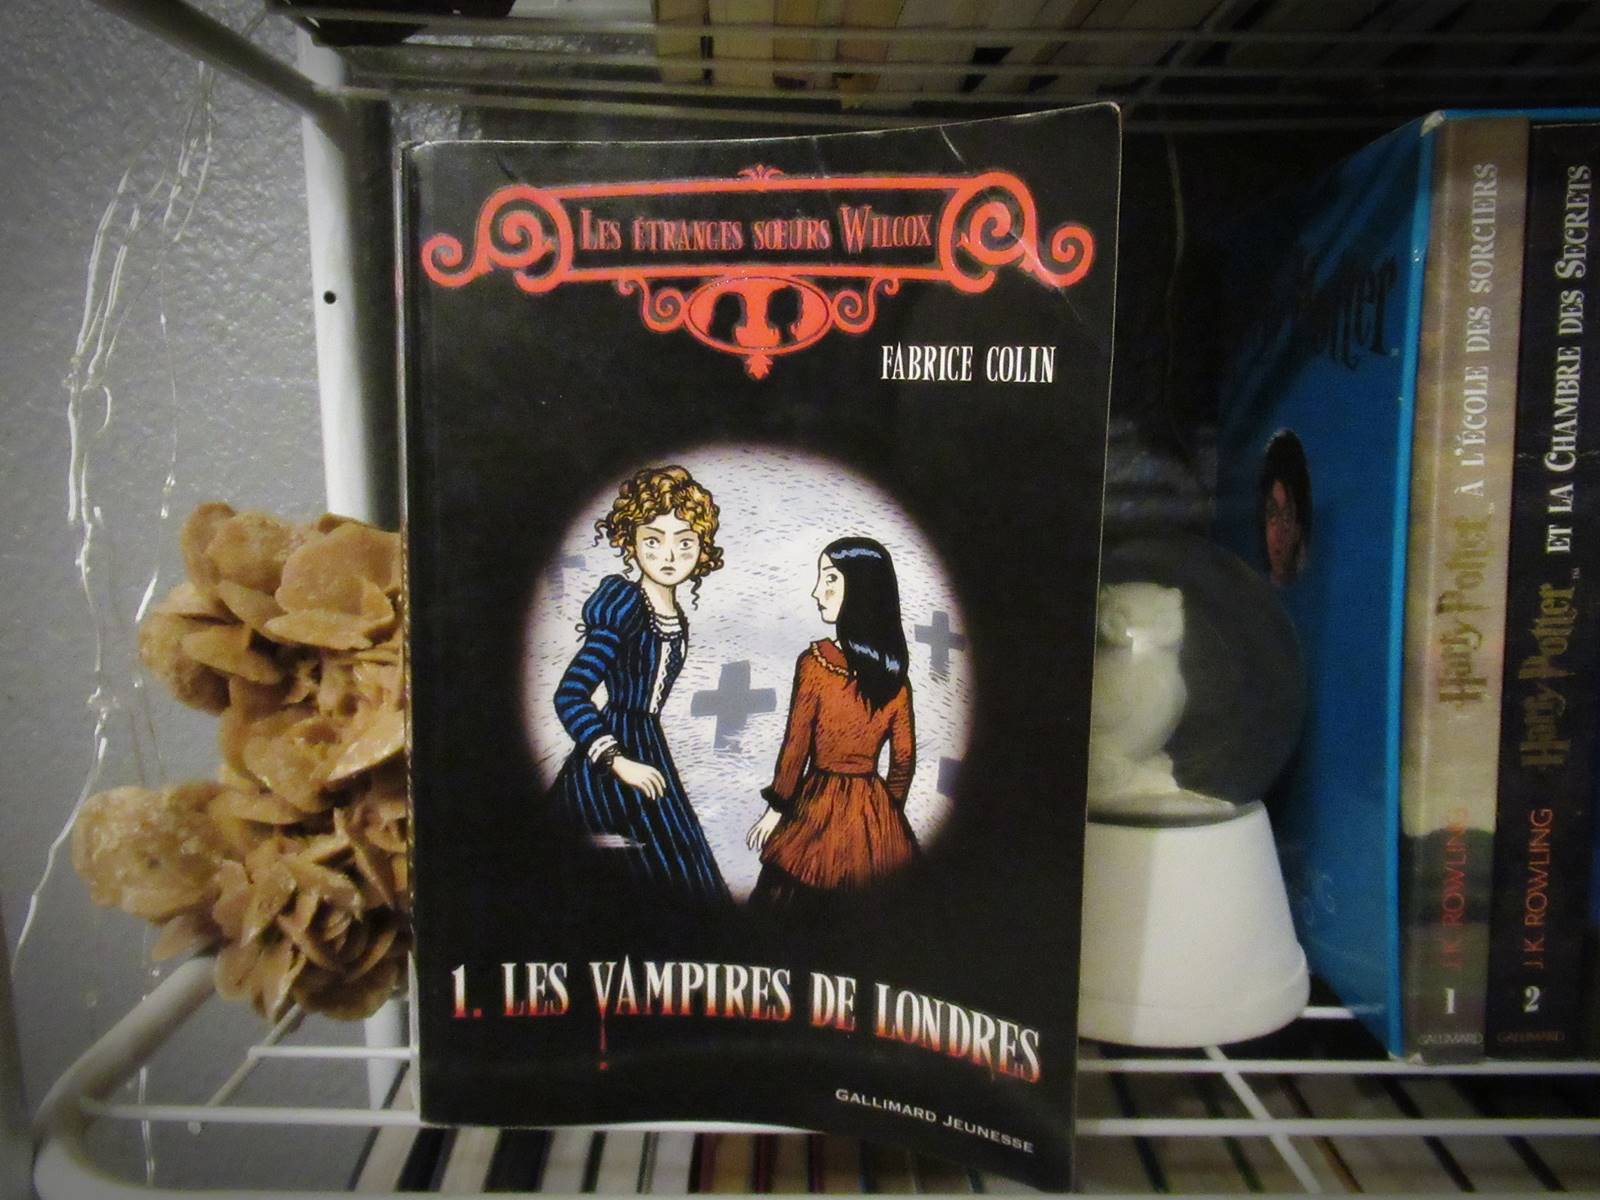 Les vampires de londres gallimard jeunesse